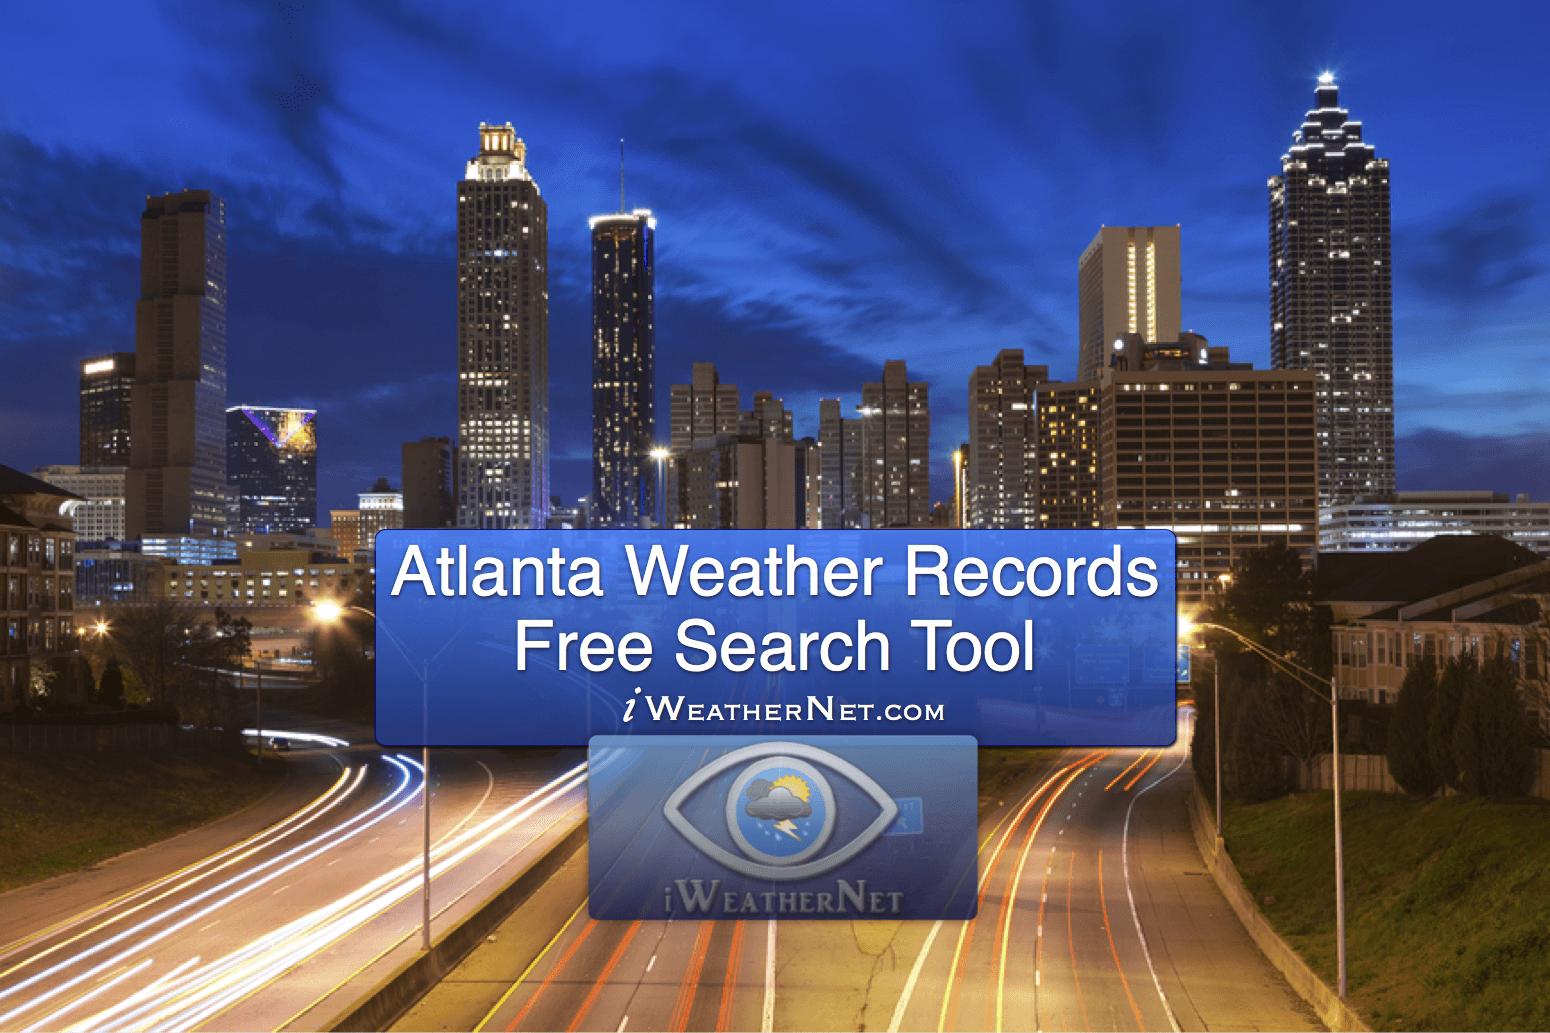 Atlanta Weather Halloween 2020 Atlanta Weather Records Database (Georgia) – iWeatherNet